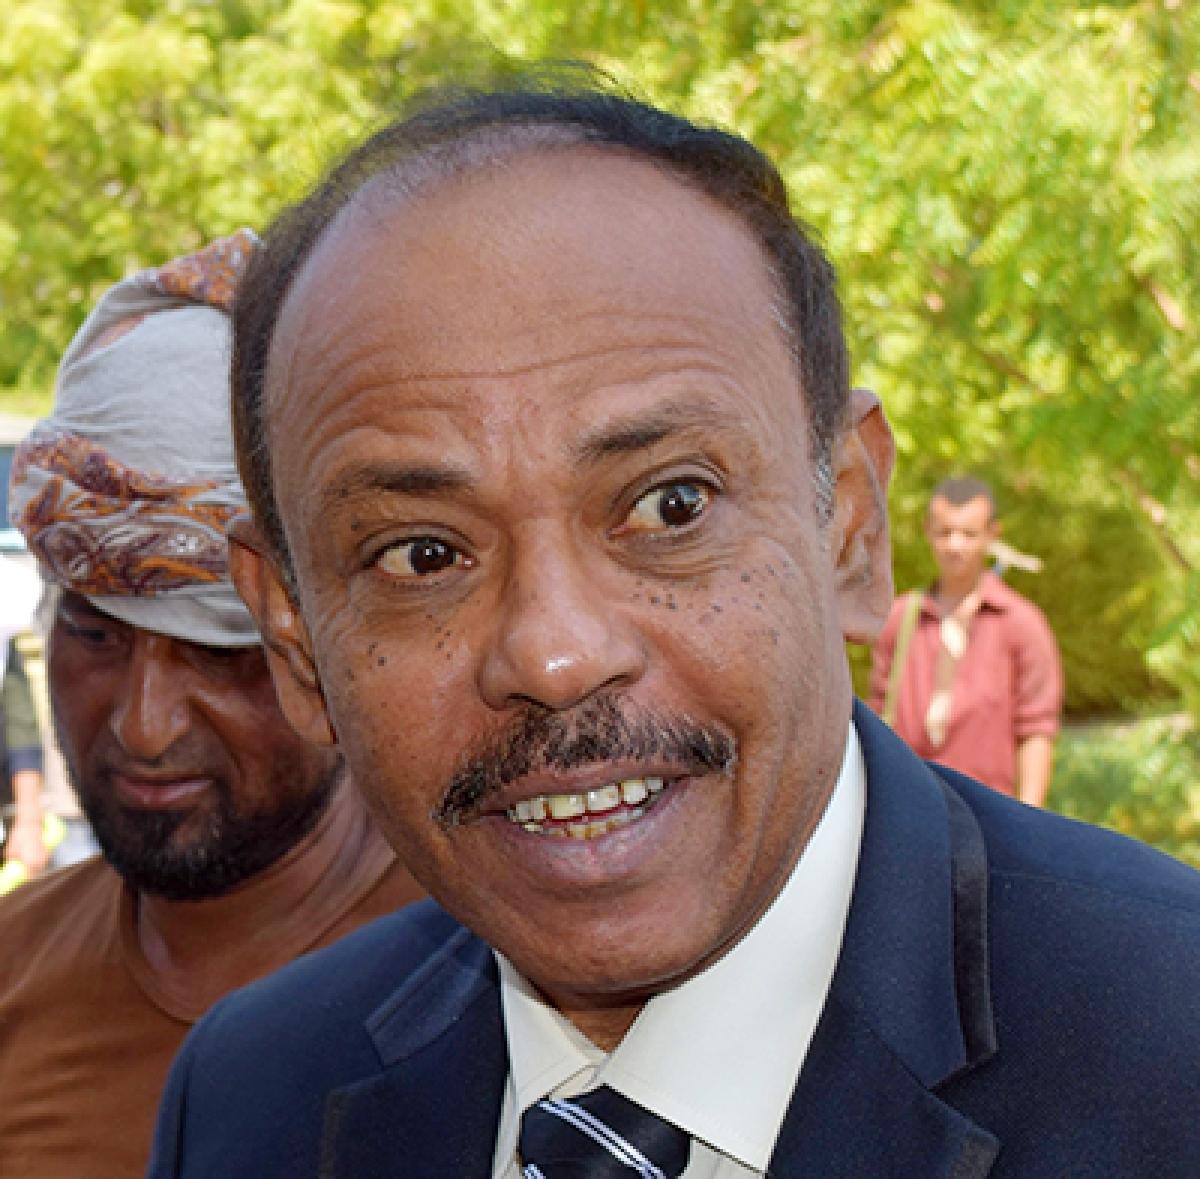 Yemen guv, 6 guards killed in blast